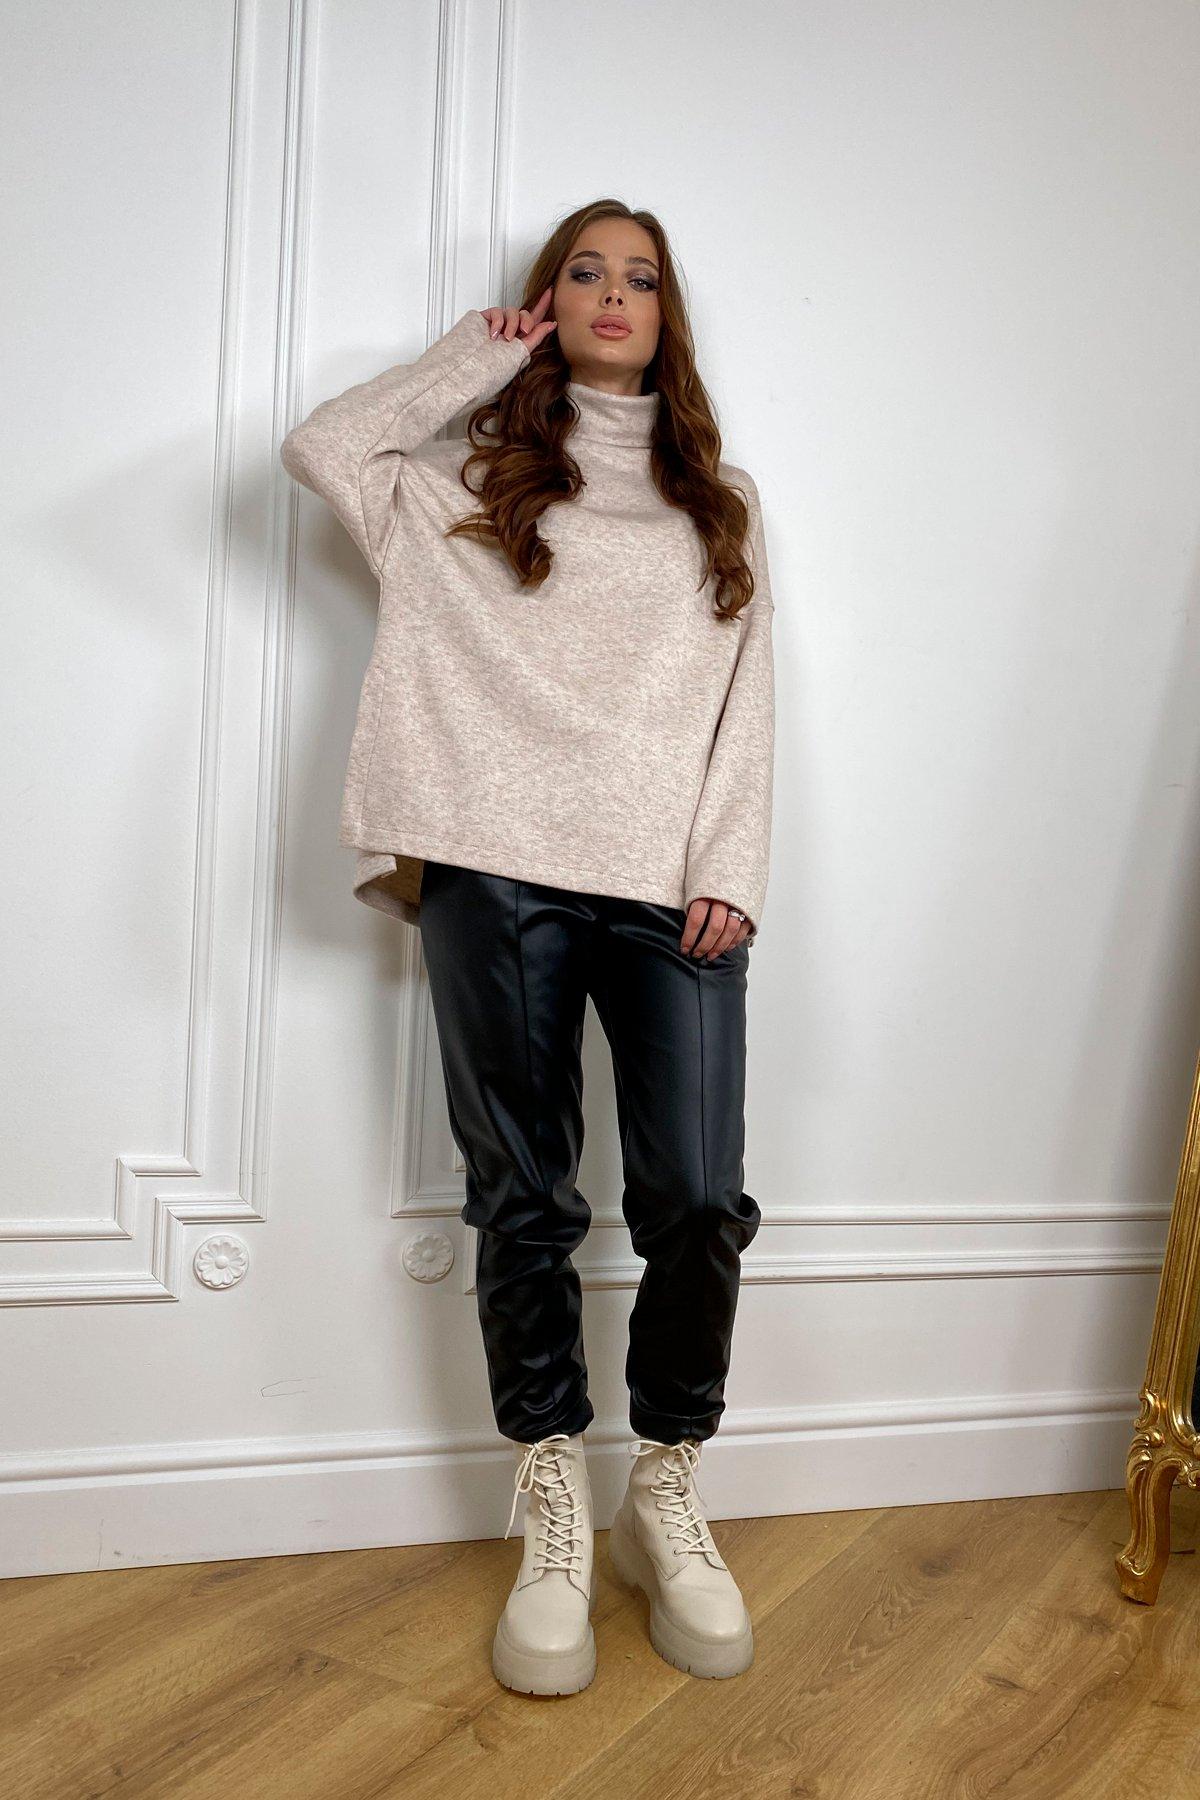 Лав Ю трикотаж ангора  свитер 10046 АРТ. 46339 Цвет: Бежевый 2 - фото 2, интернет магазин tm-modus.ru